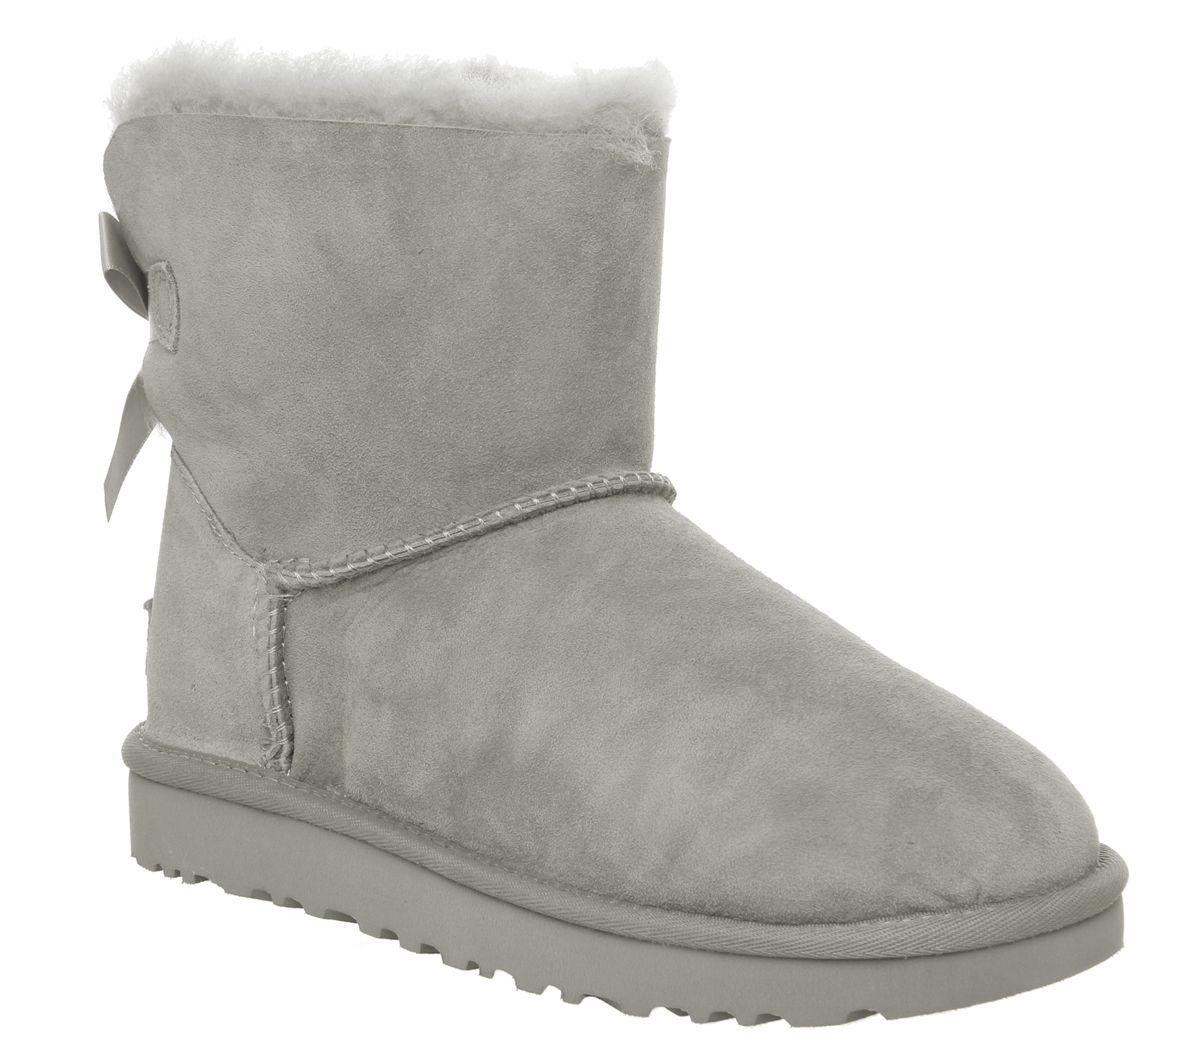 696081c7228 Mini Bailey Bow Boots